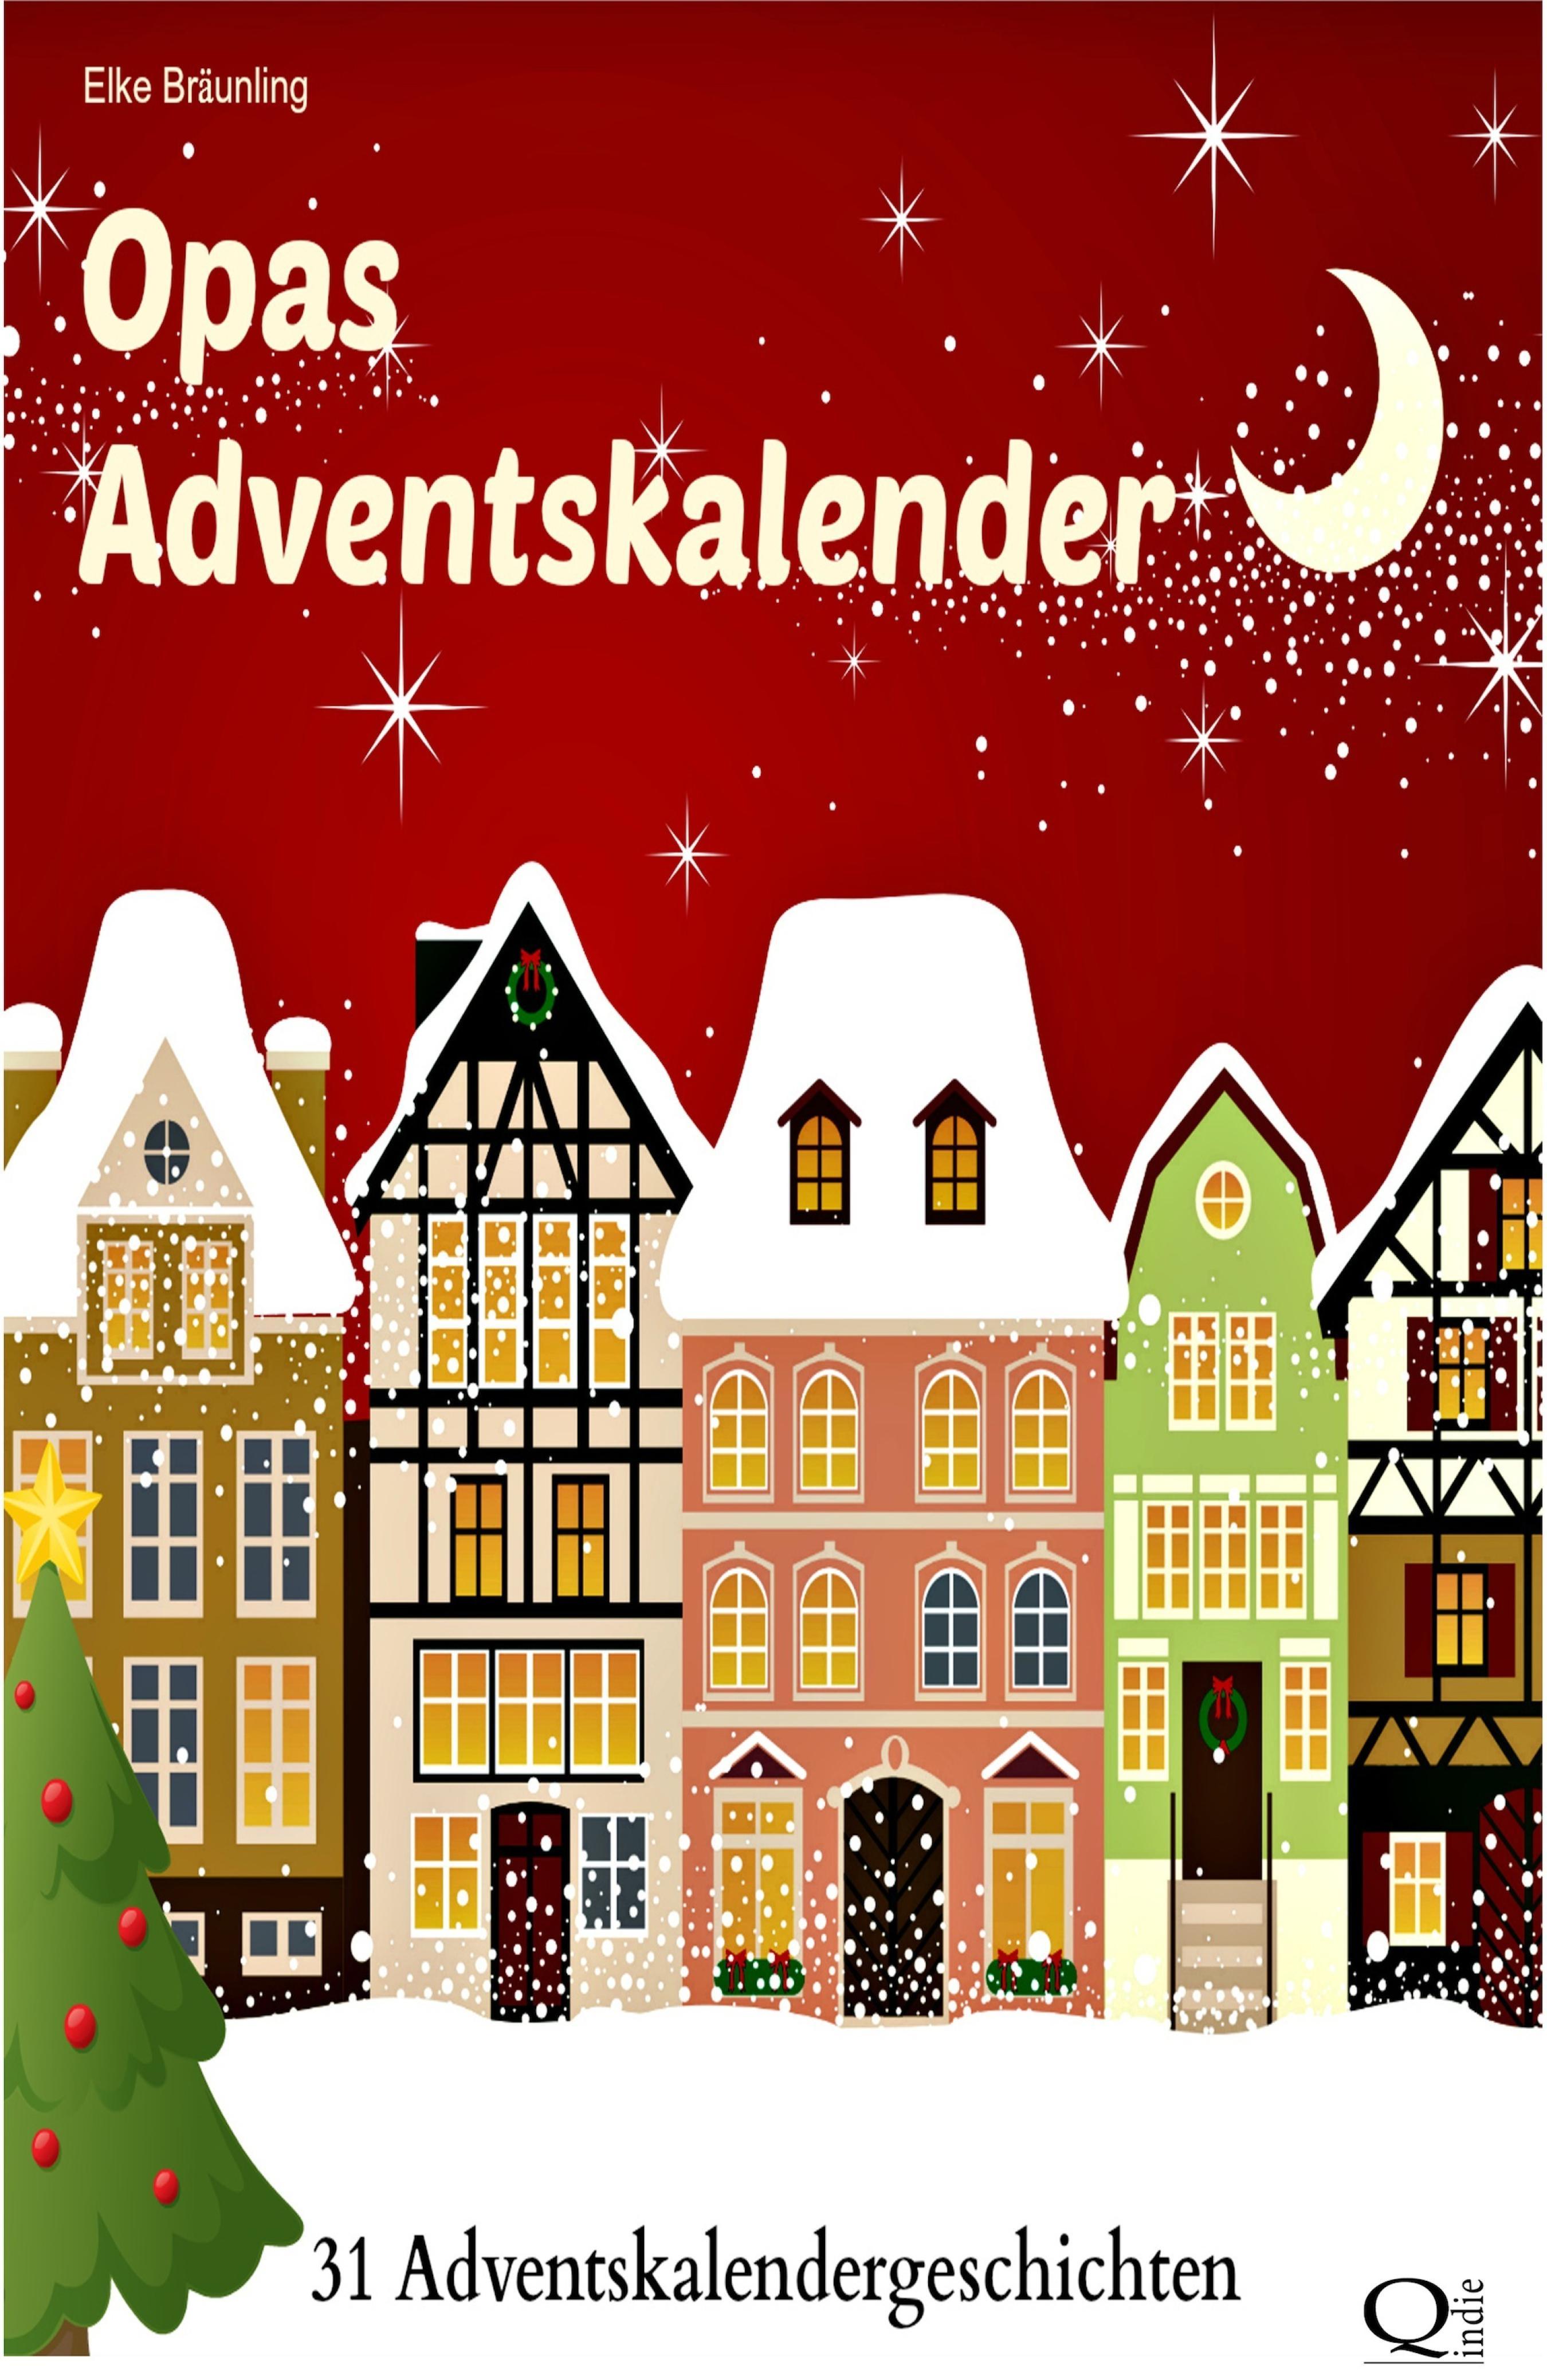 Elke Braunling Opas Adventskalender - 31 Adventskalendergeschichten